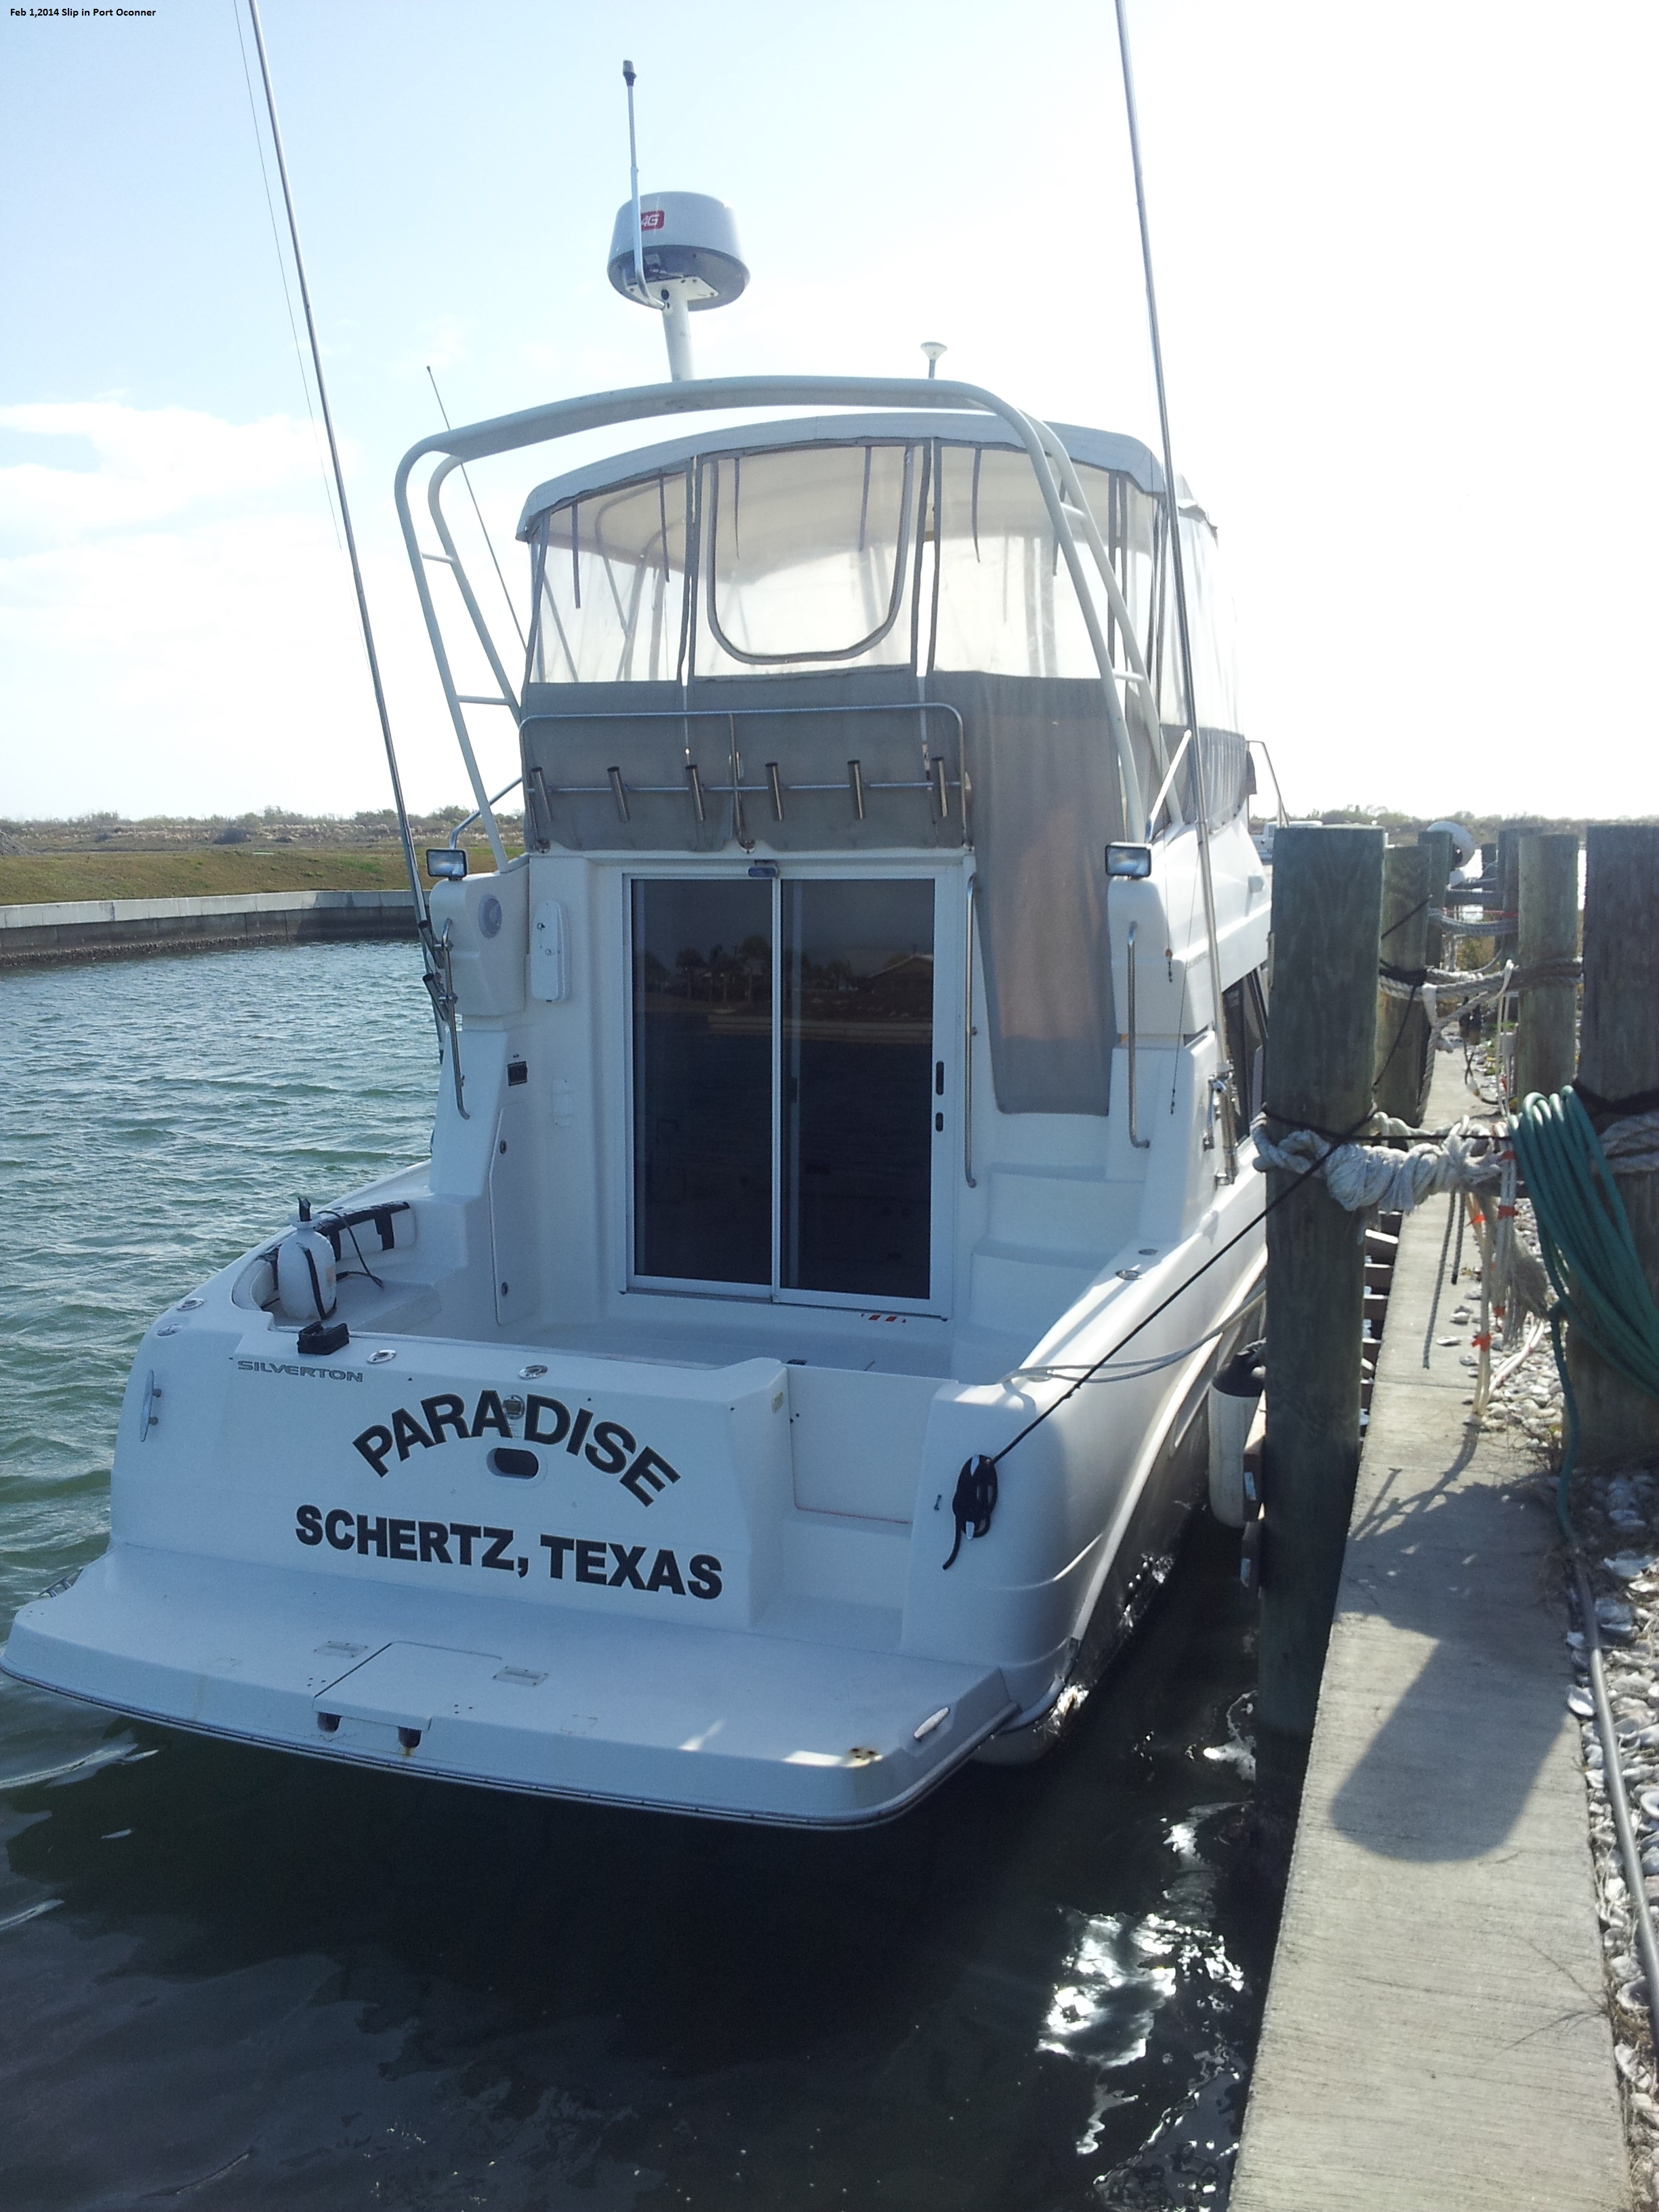 Fishing Boats - Texas Deep Sea Fishing Charters Guide Service